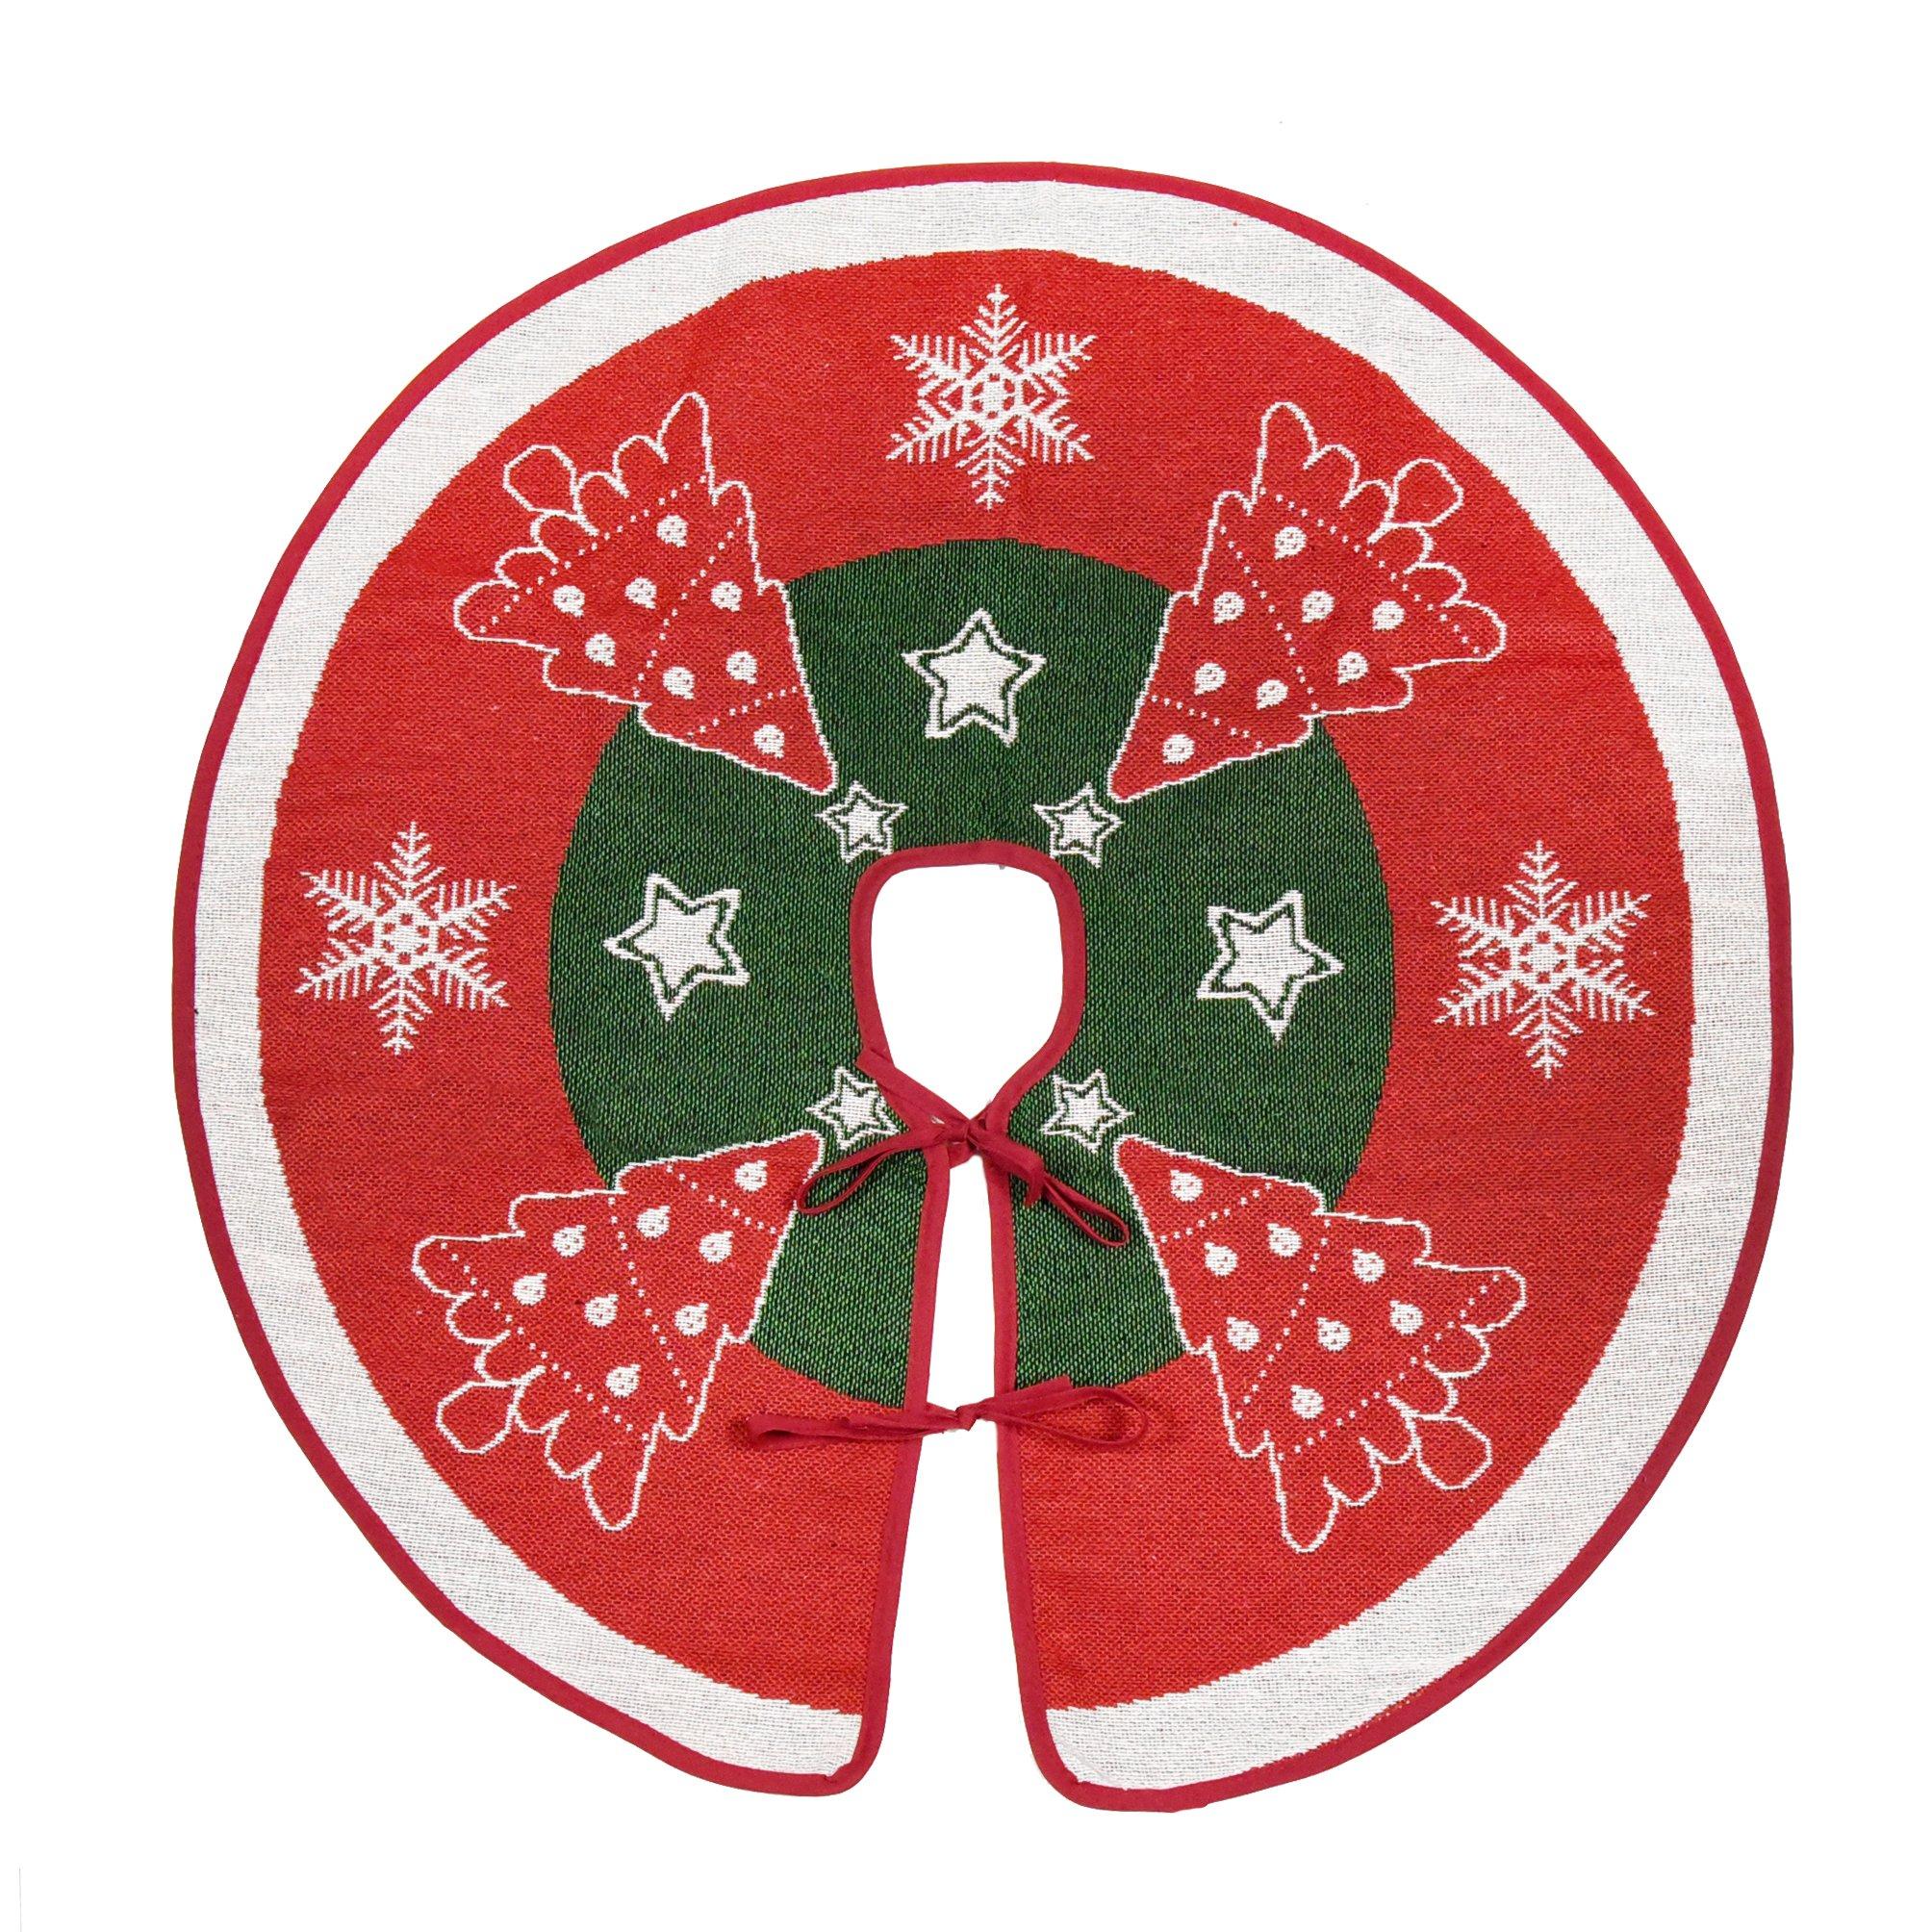 Primode Red Xmas Tree Skirt 30'', Pine Trees, Stars and Snowflakes Design Jacquard Woven